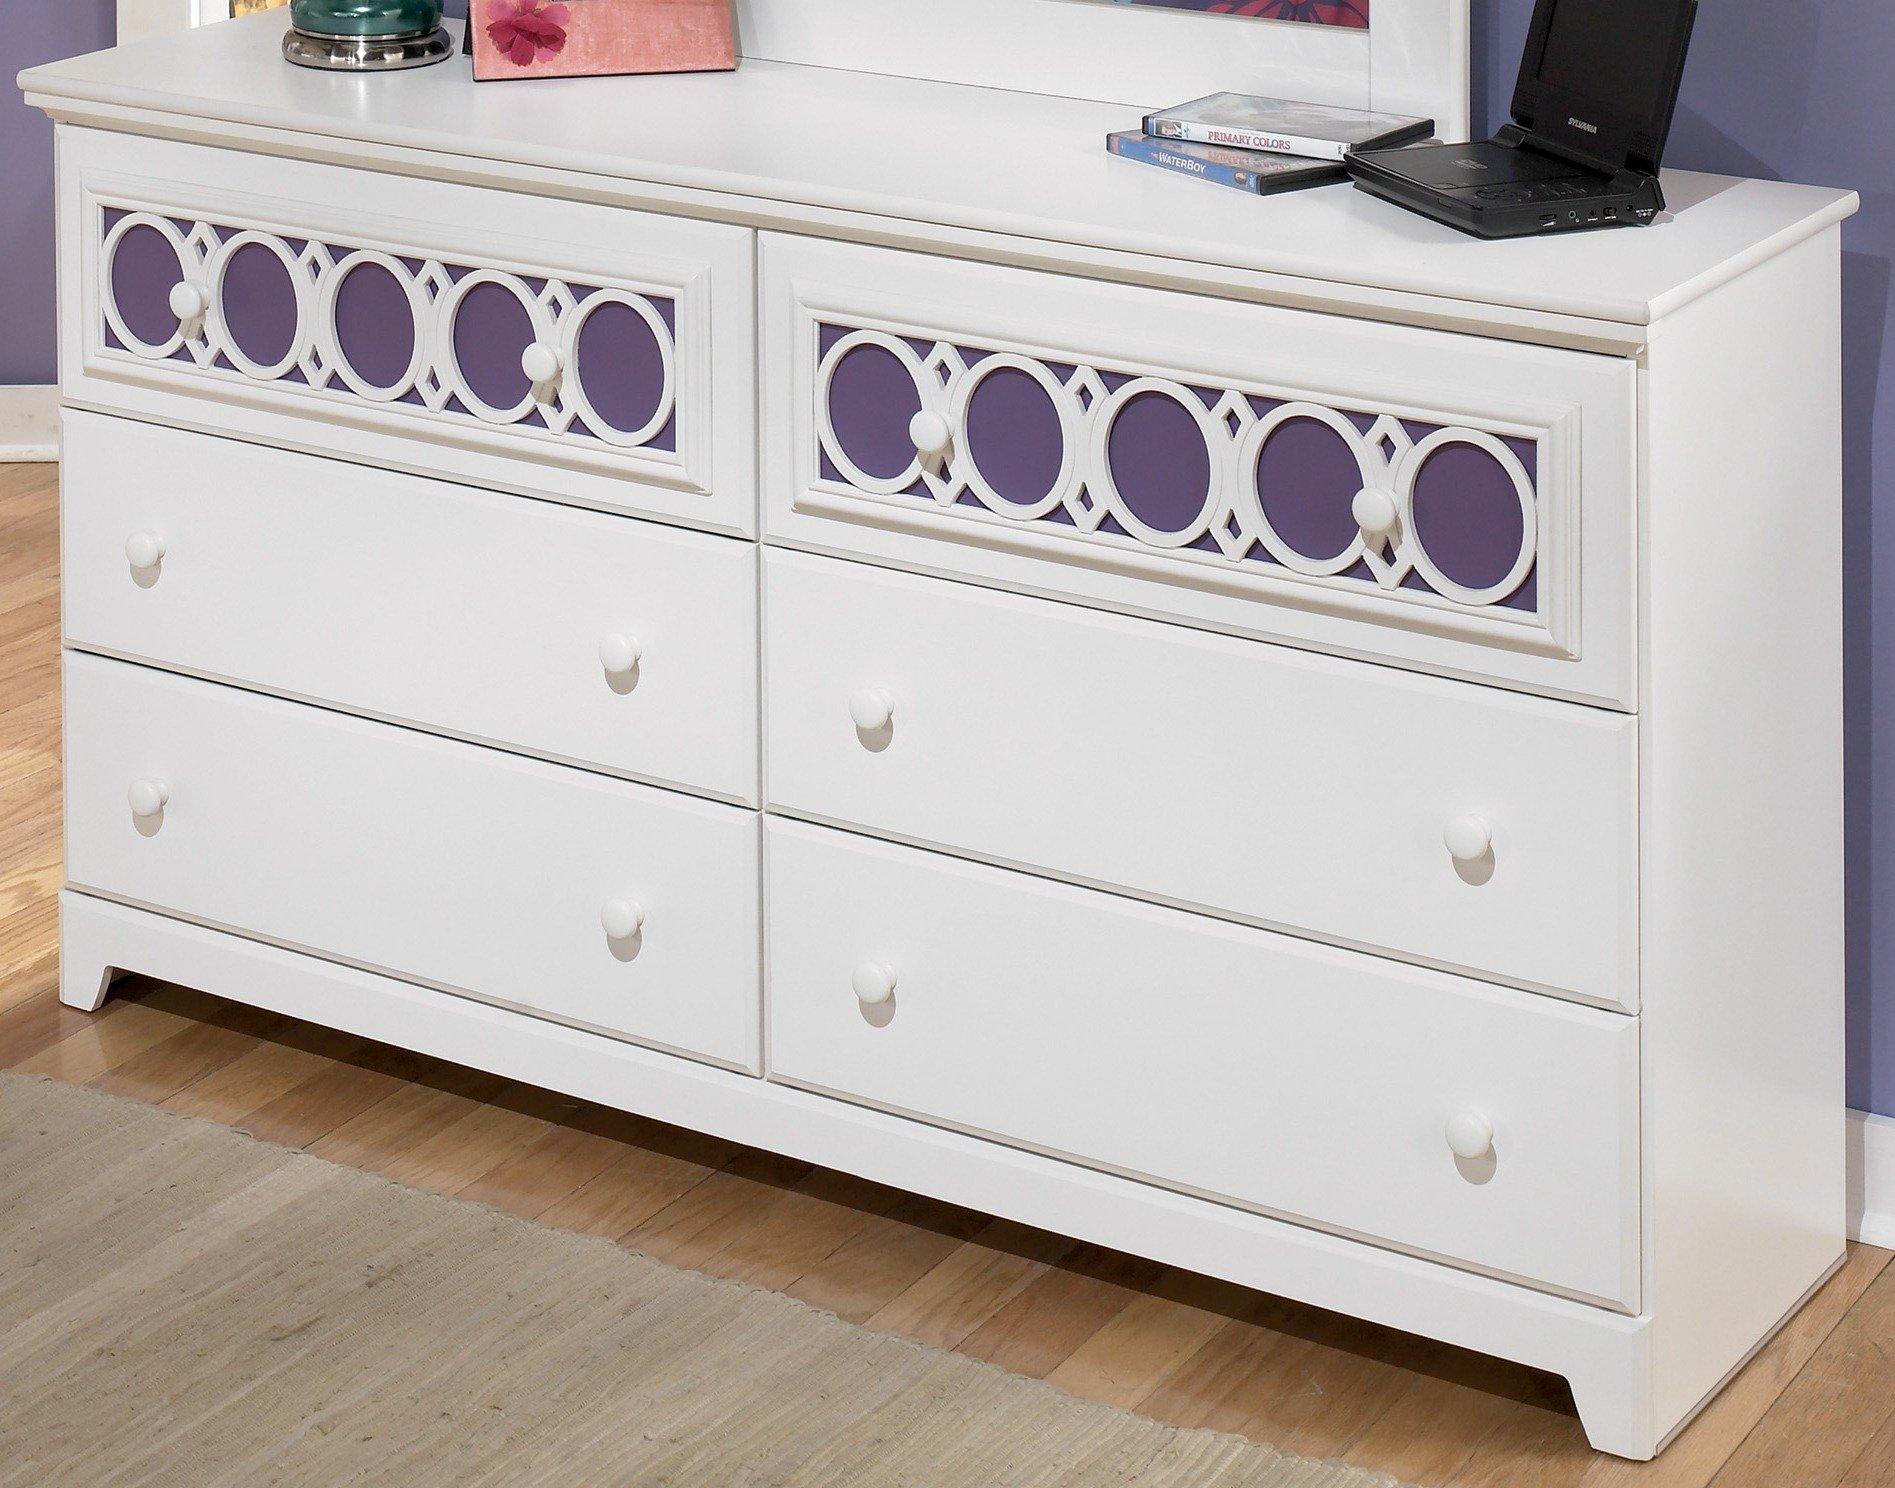 Ashley Furniture Signature Design - Zayley Dresser - 6 Drawers - Engineered Wood - White by Signature Design by Ashley